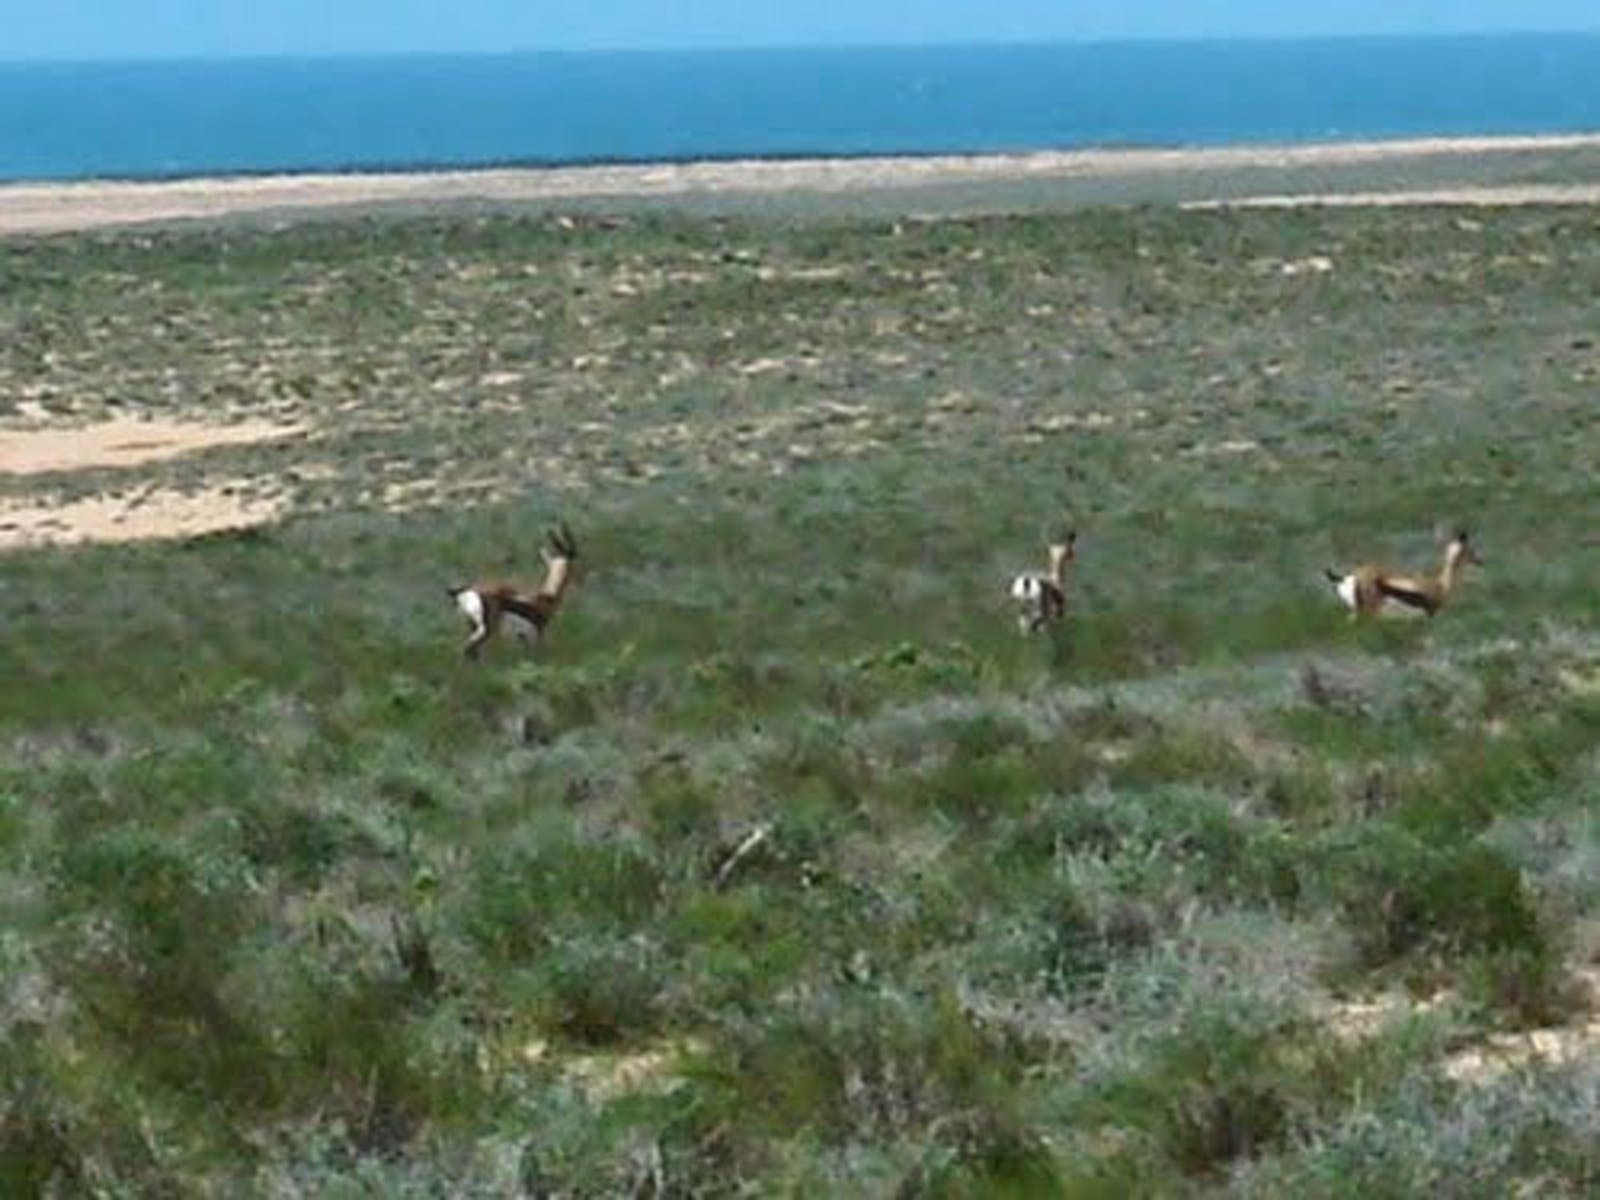 Hobyo Grasslands and Shrublands